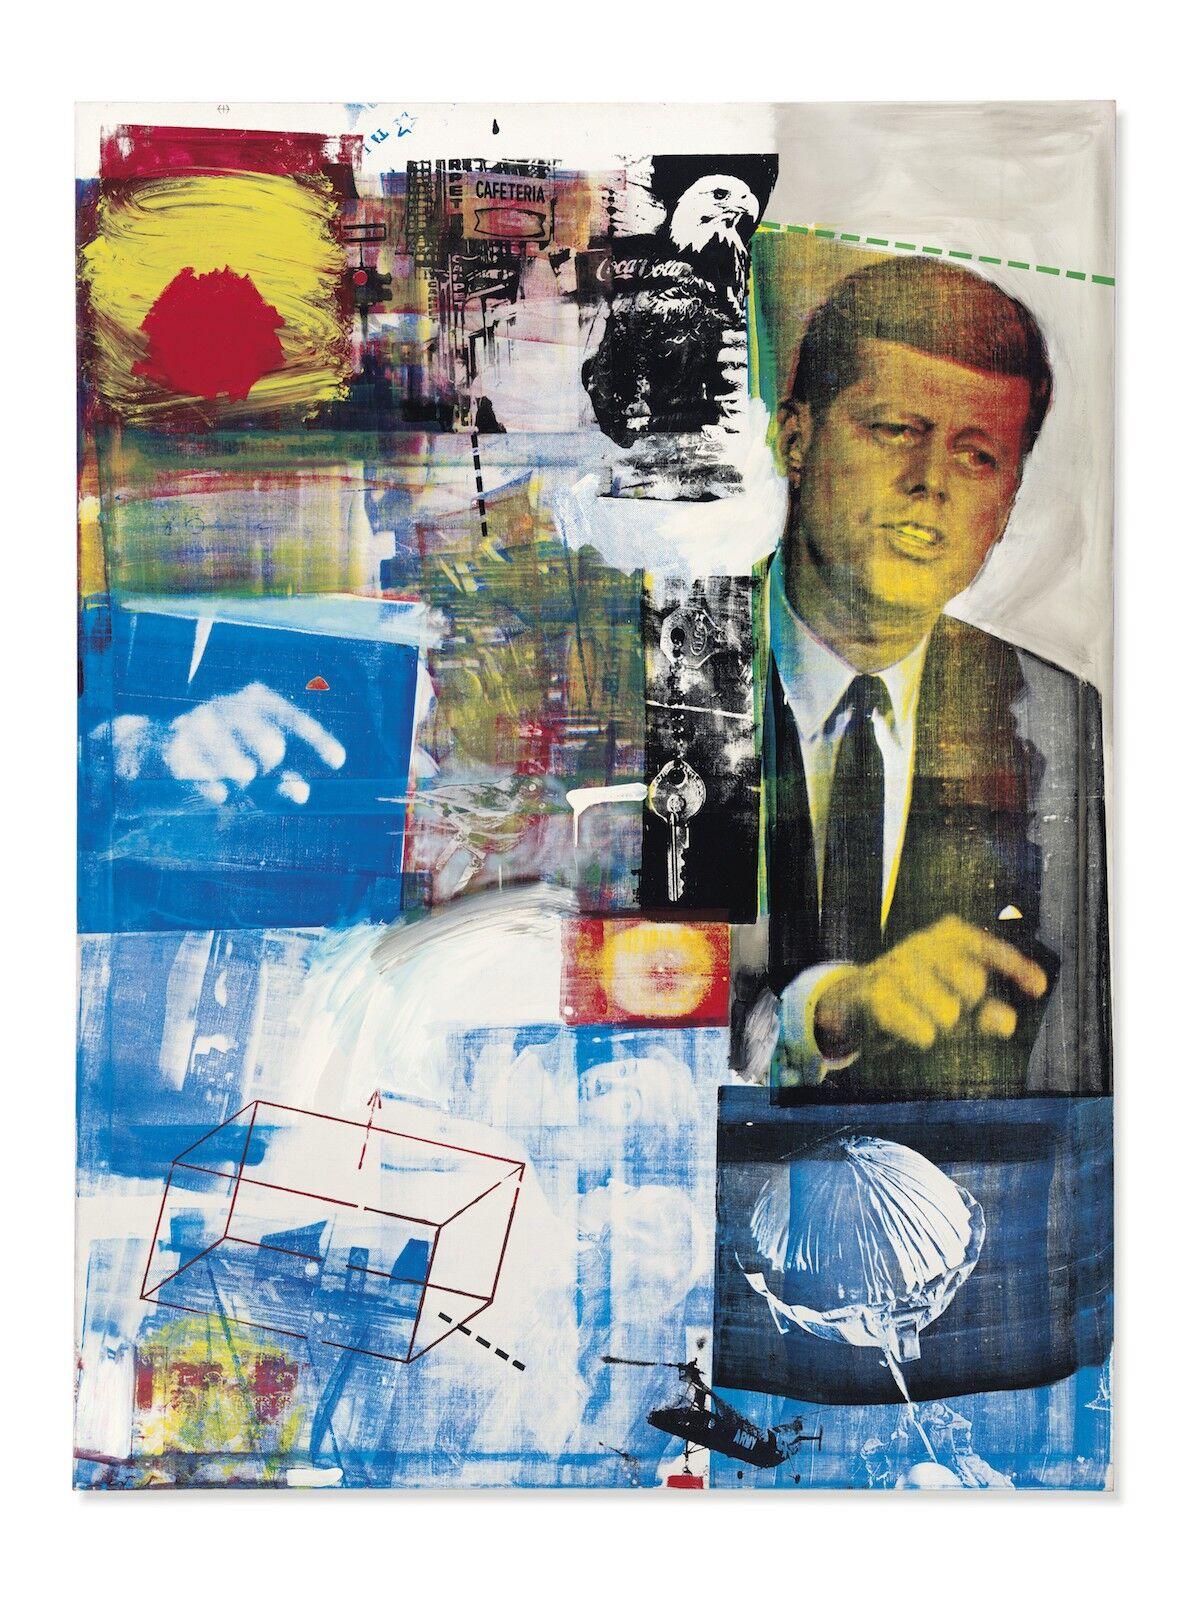 Robert Rauschenberg, Buffalo II, 1964. Est. $50 million. Courtesy Christie's.